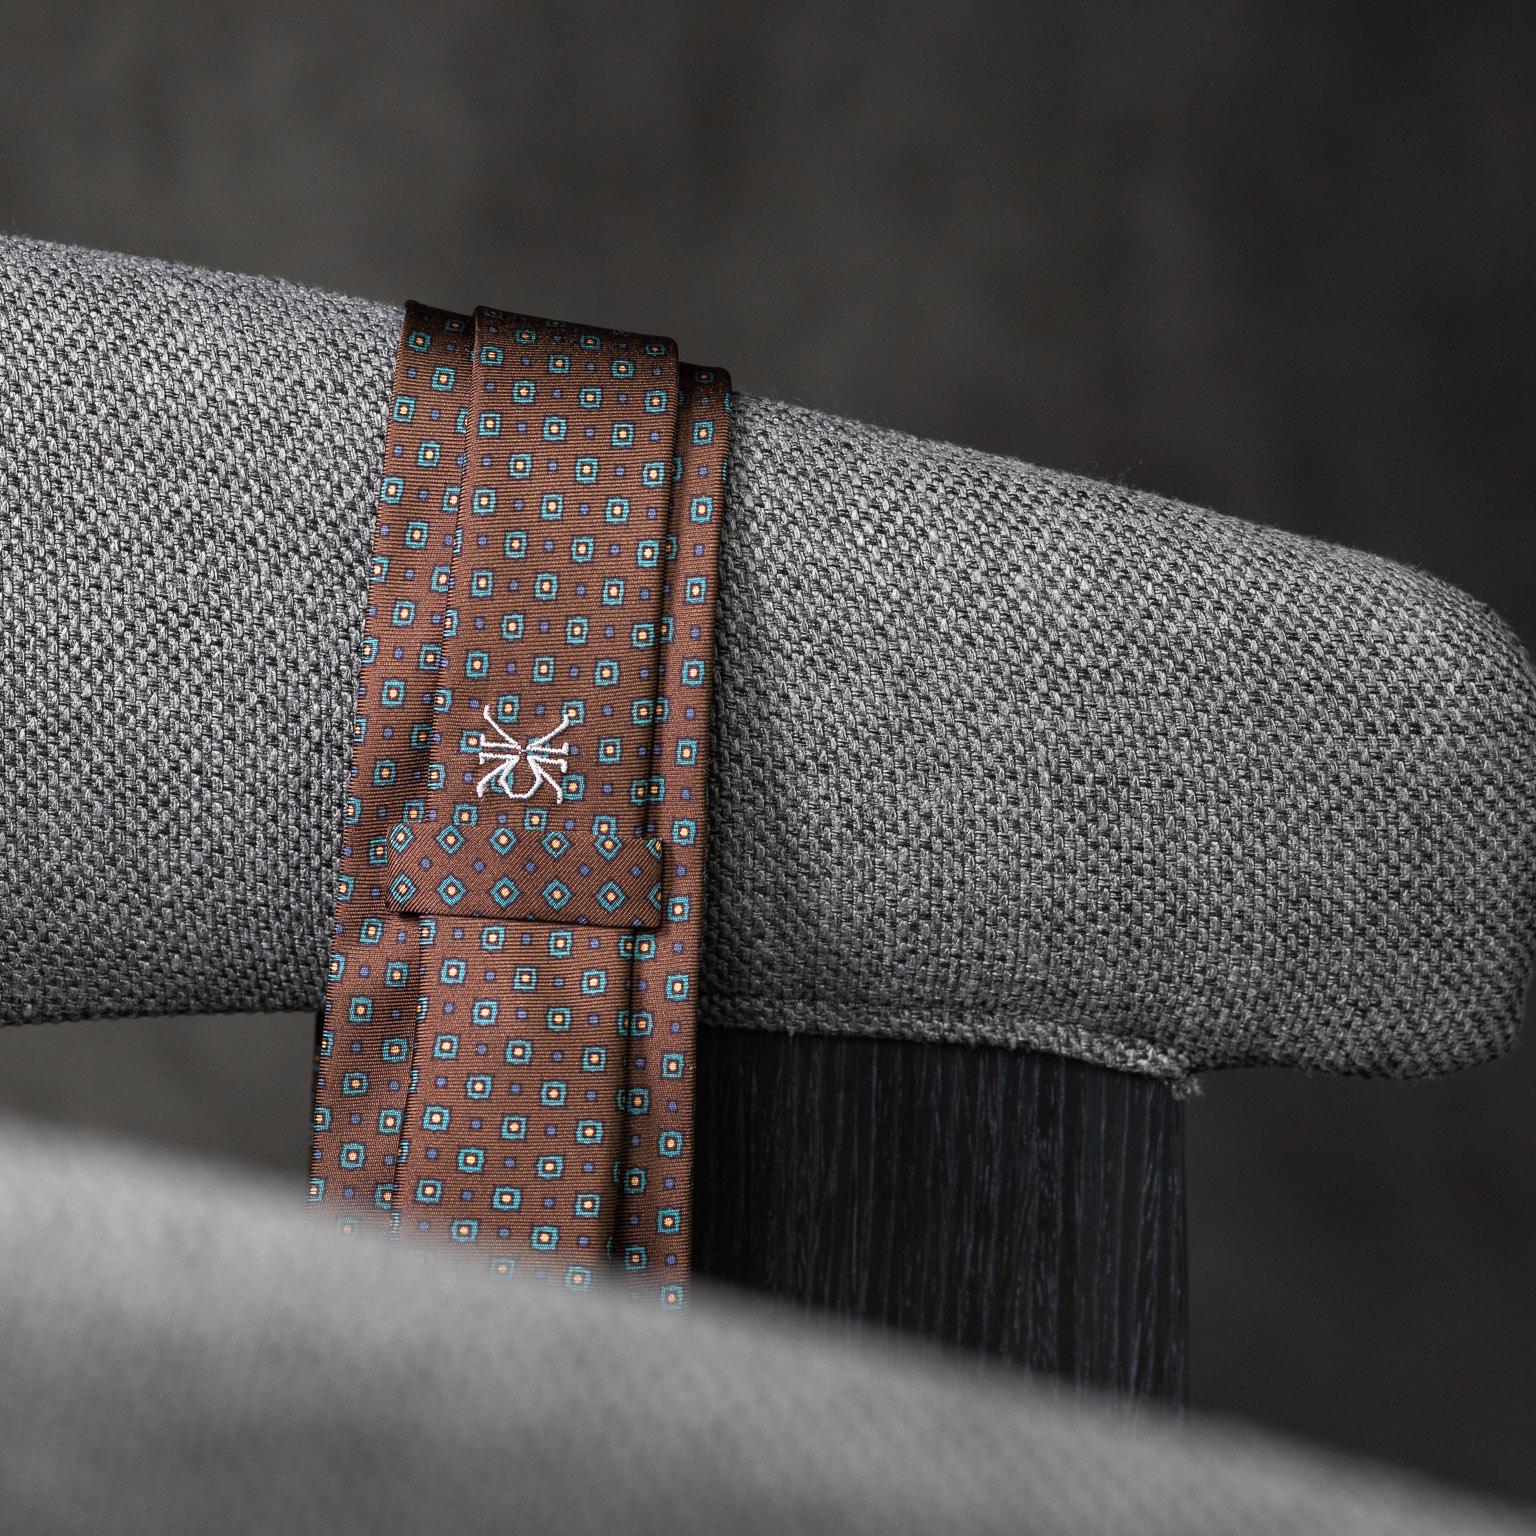 PRINTED-SILK-SEDA-ESTAMPADA-0588-Tie-Initials-Corbata-Iniciales-The-Seelk-4